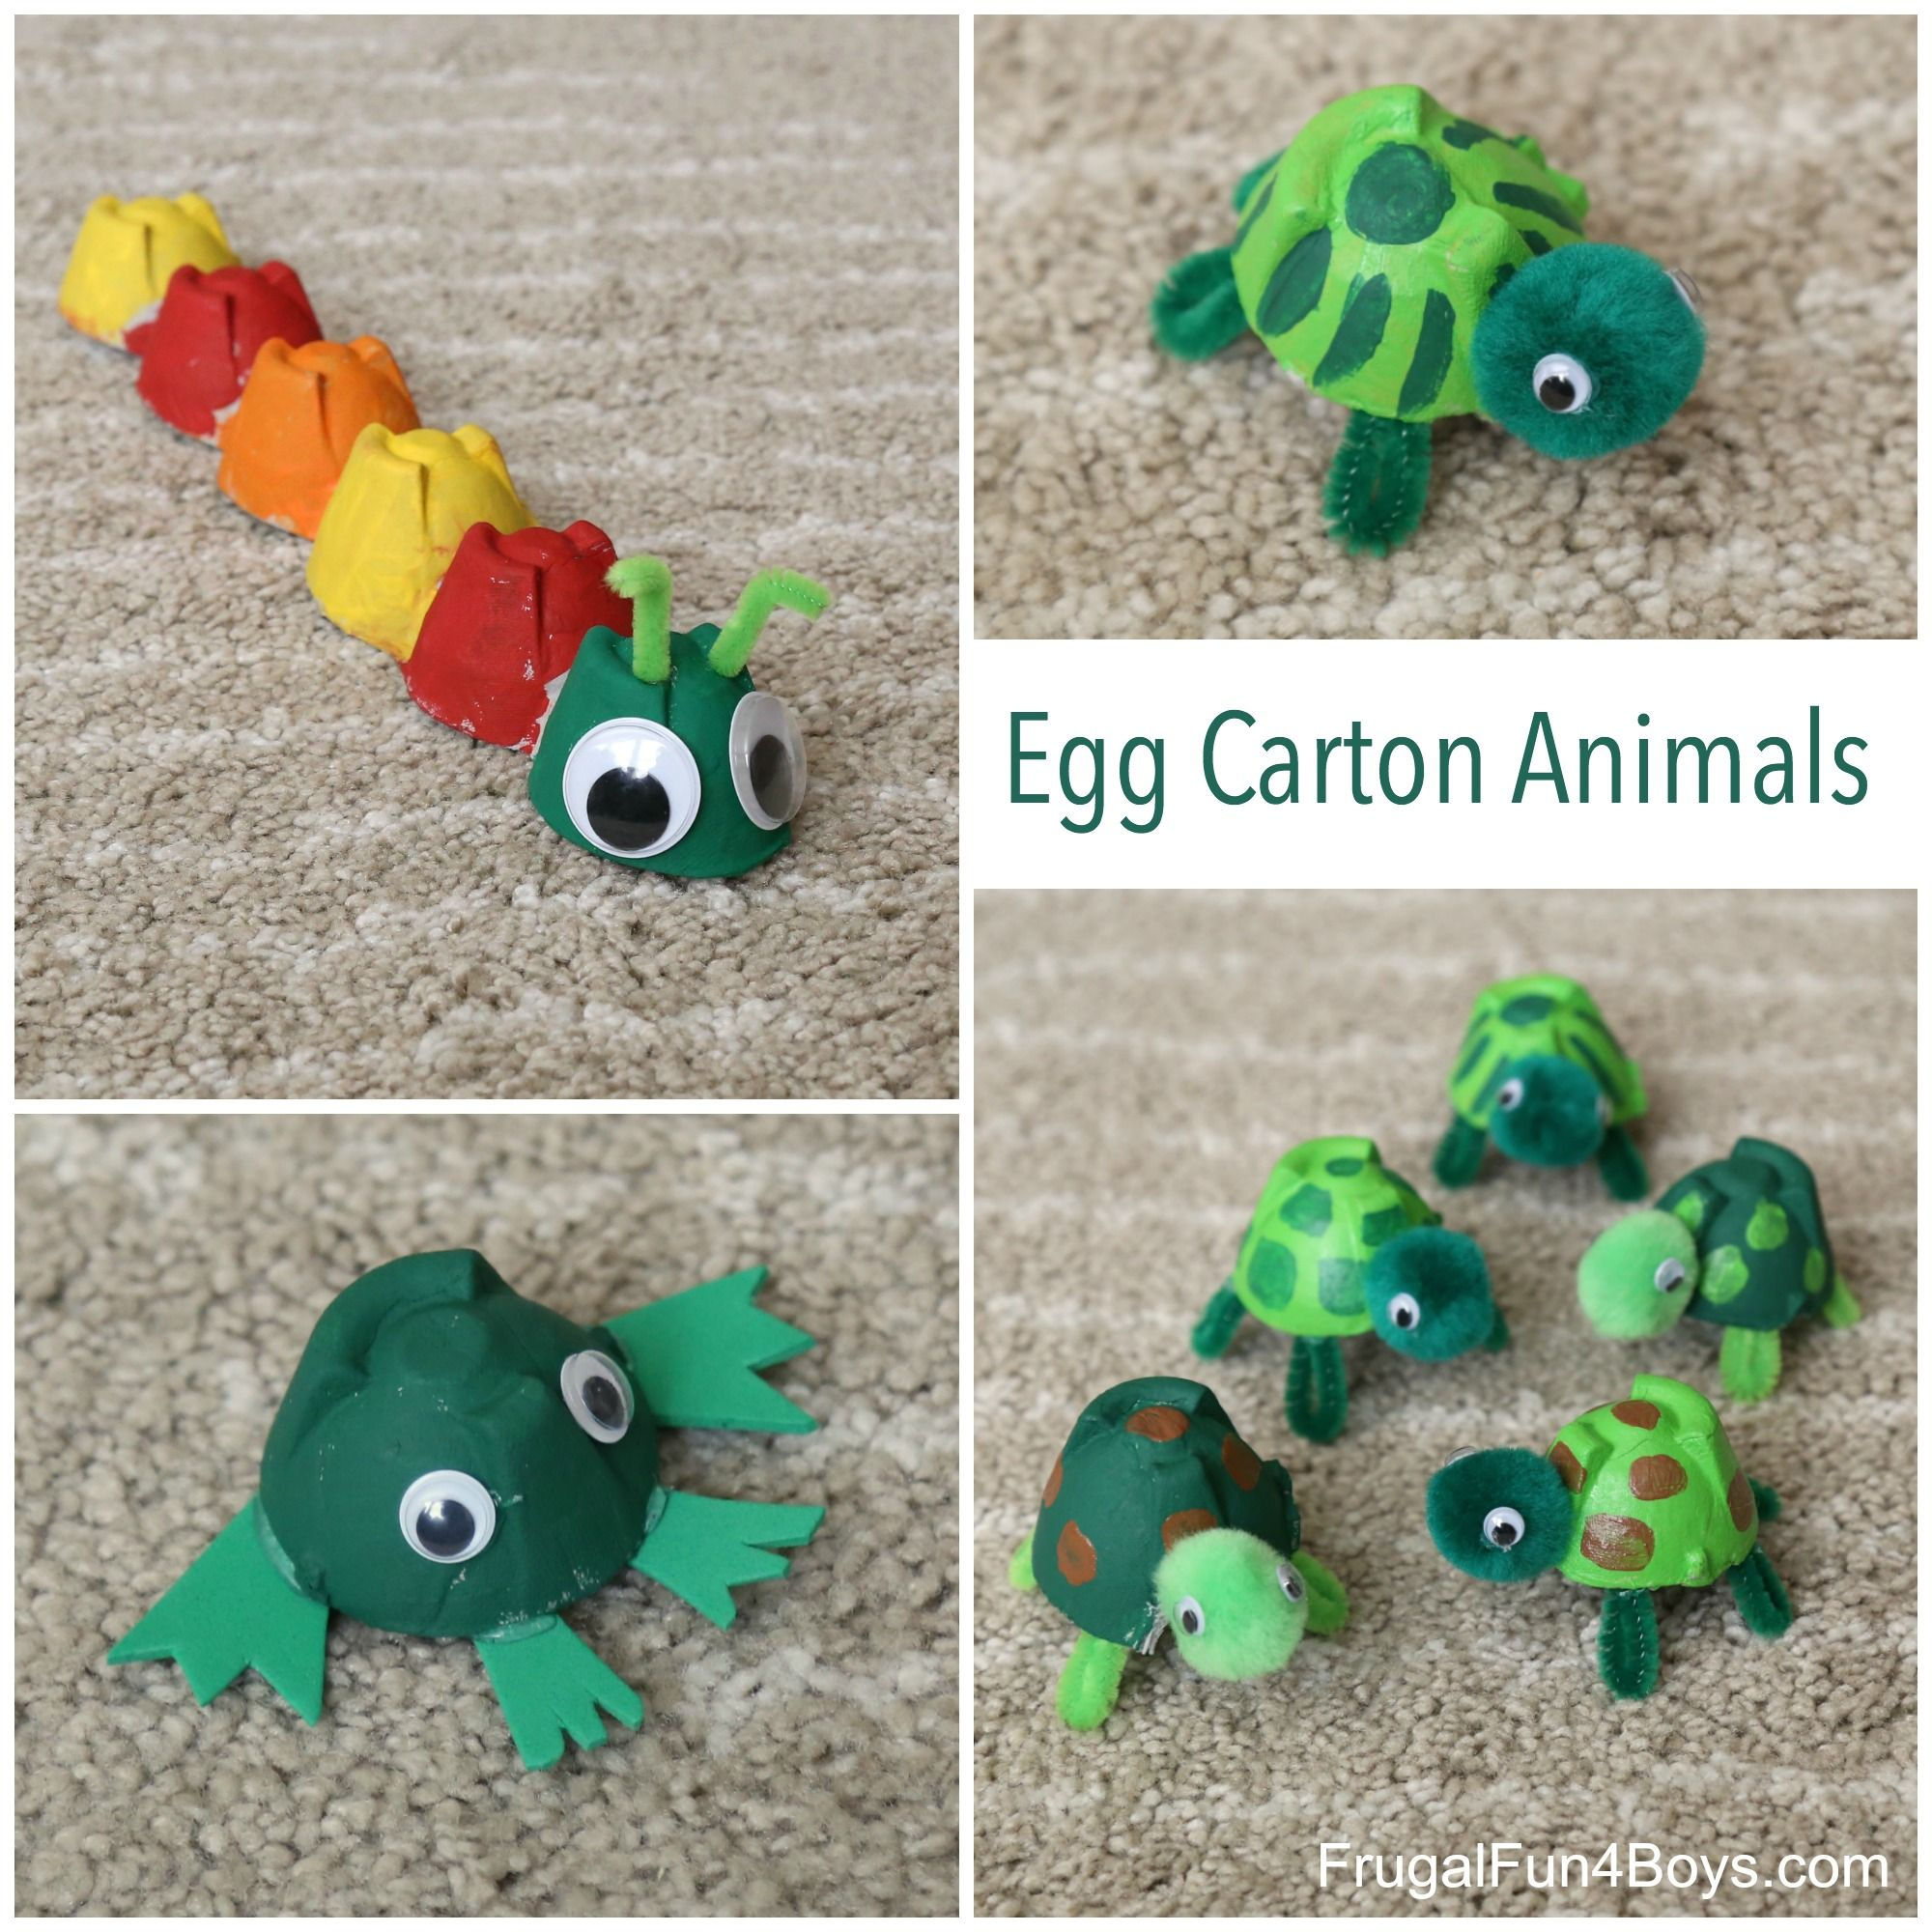 Adorable Egg Carton Turtle Craft And A Caterpillar Frog Too Sylvanian Families Bott Ant 9 Animal Make Turtles Caterpillars Frogs